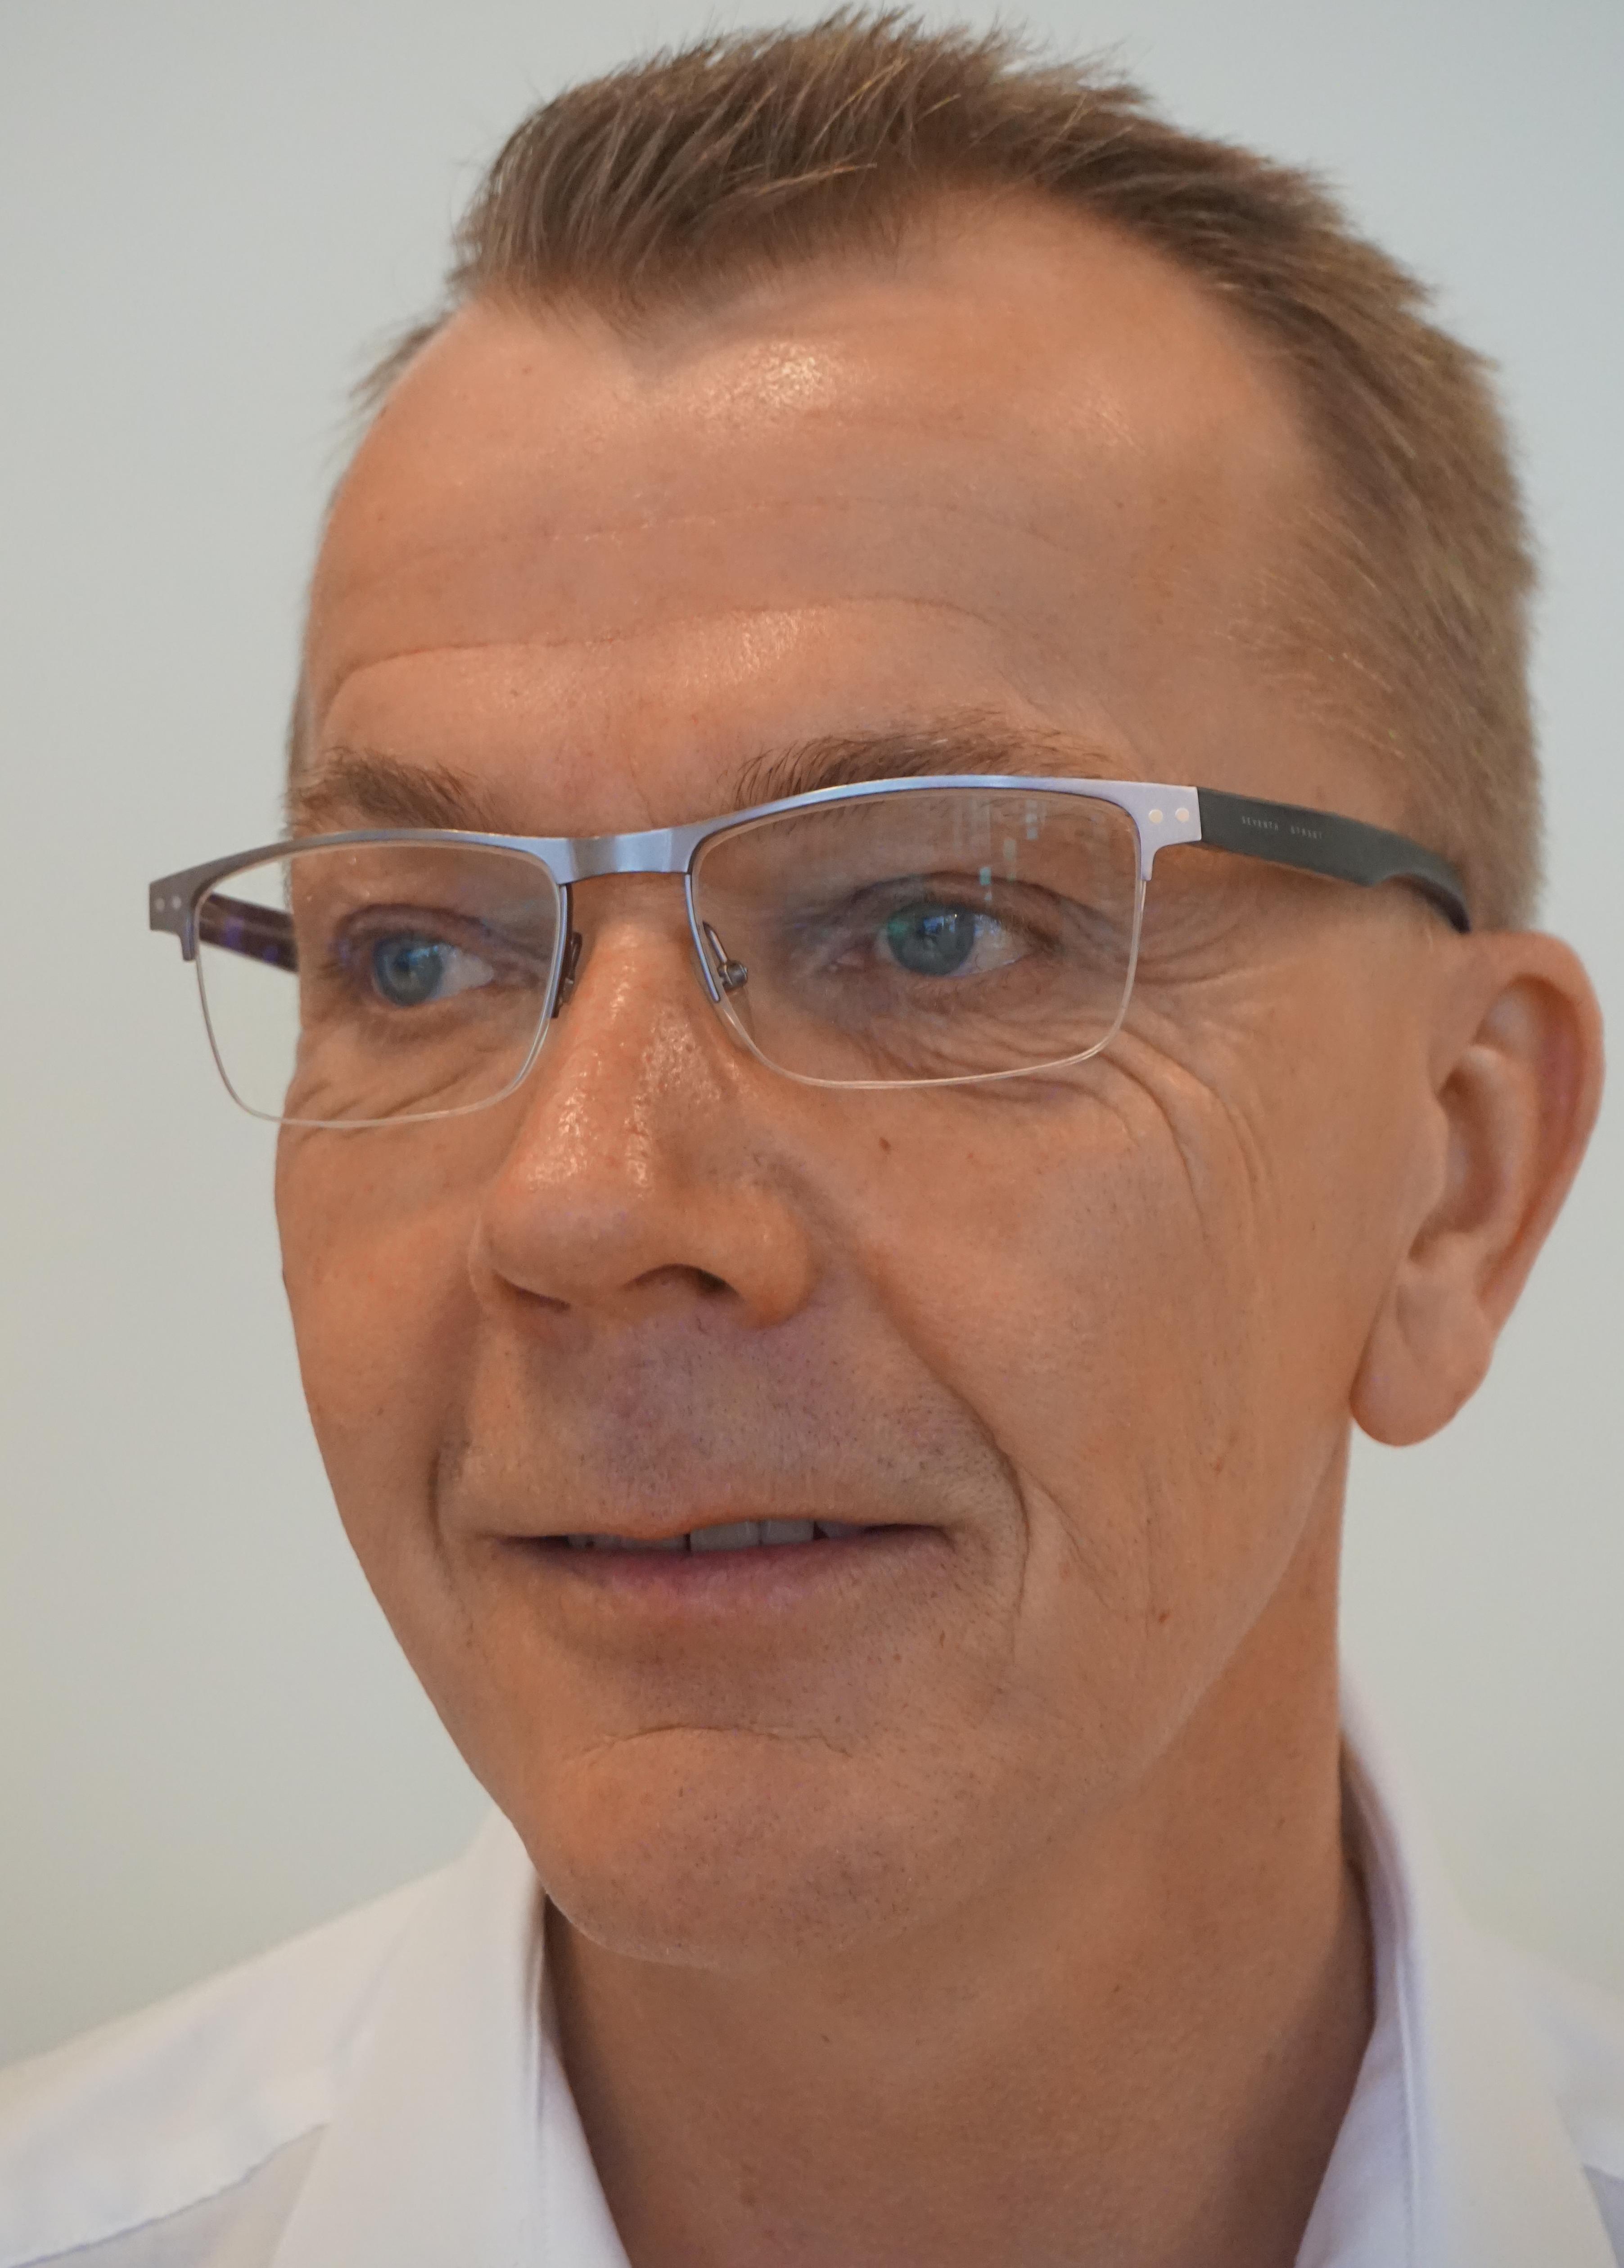 Jocke Stefanius